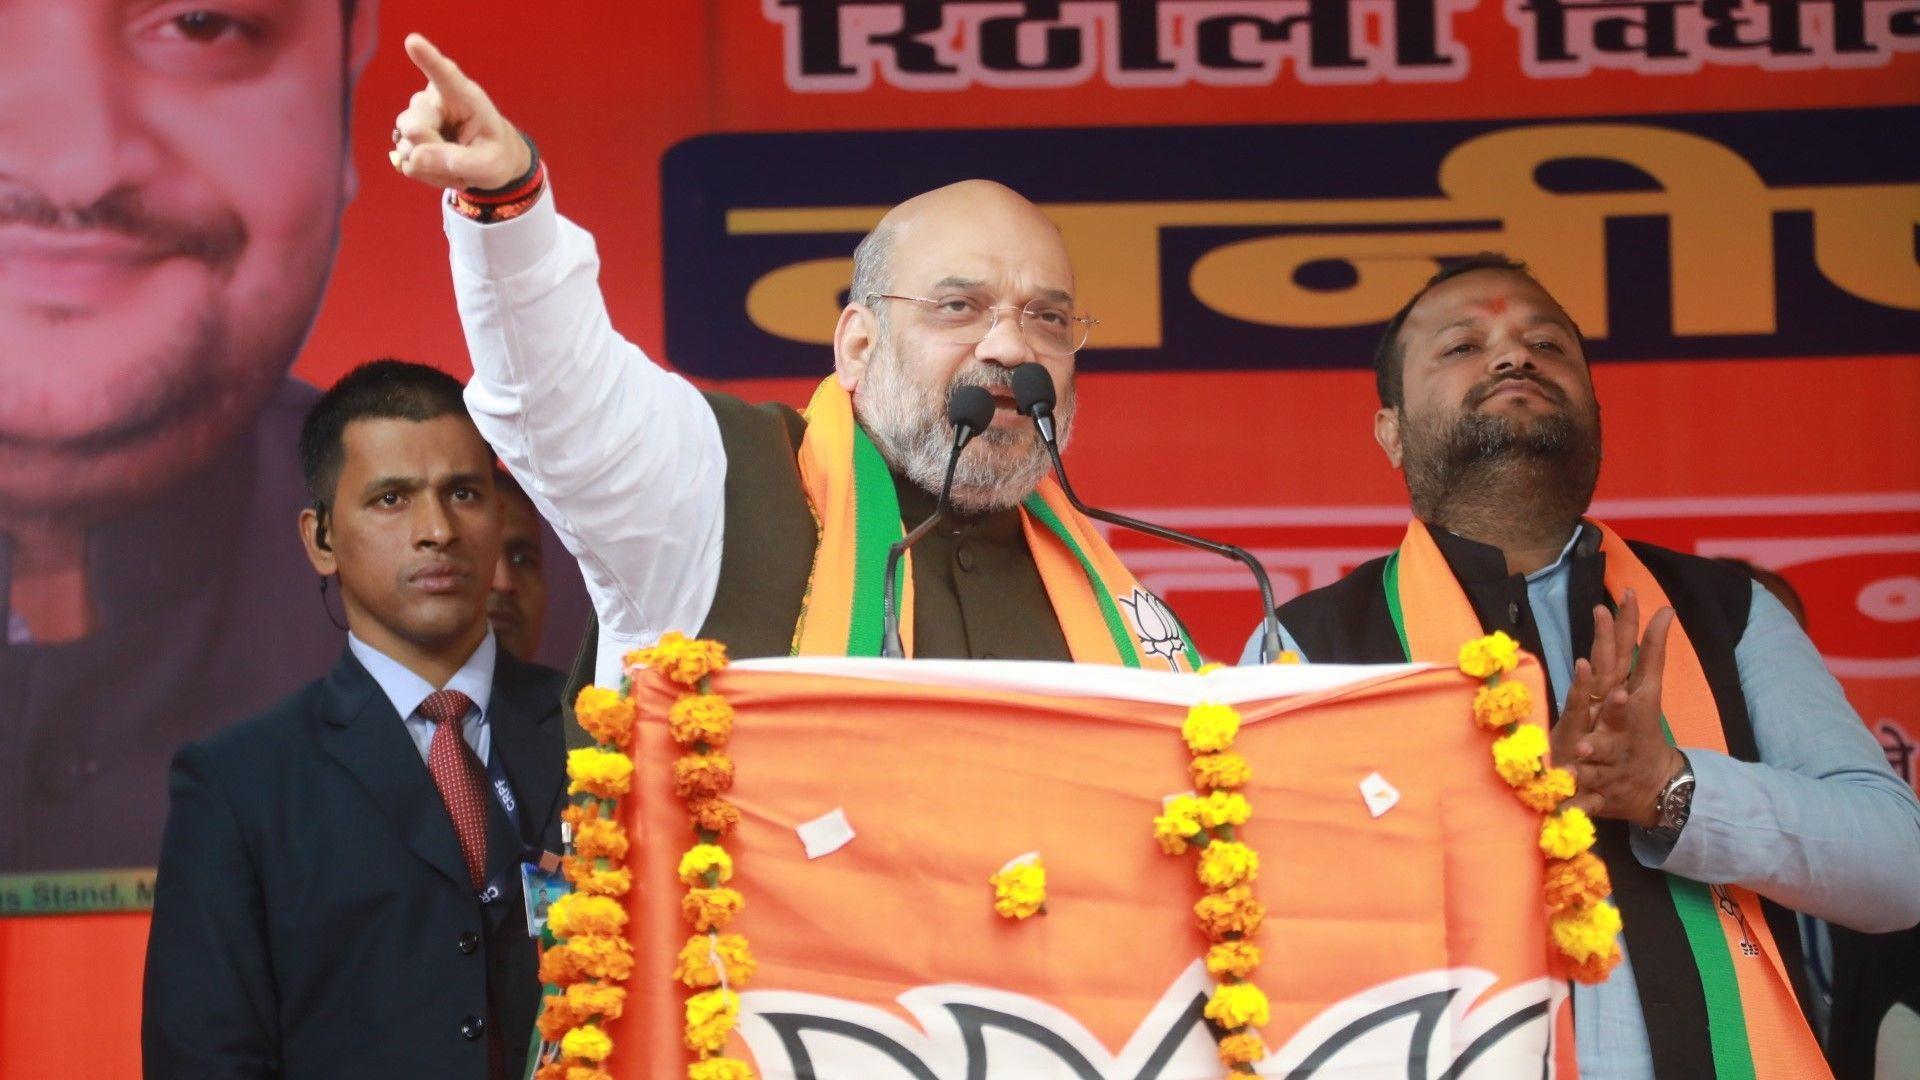 BJP in trouble due to kisan andolan in delhi - Satya Hindi